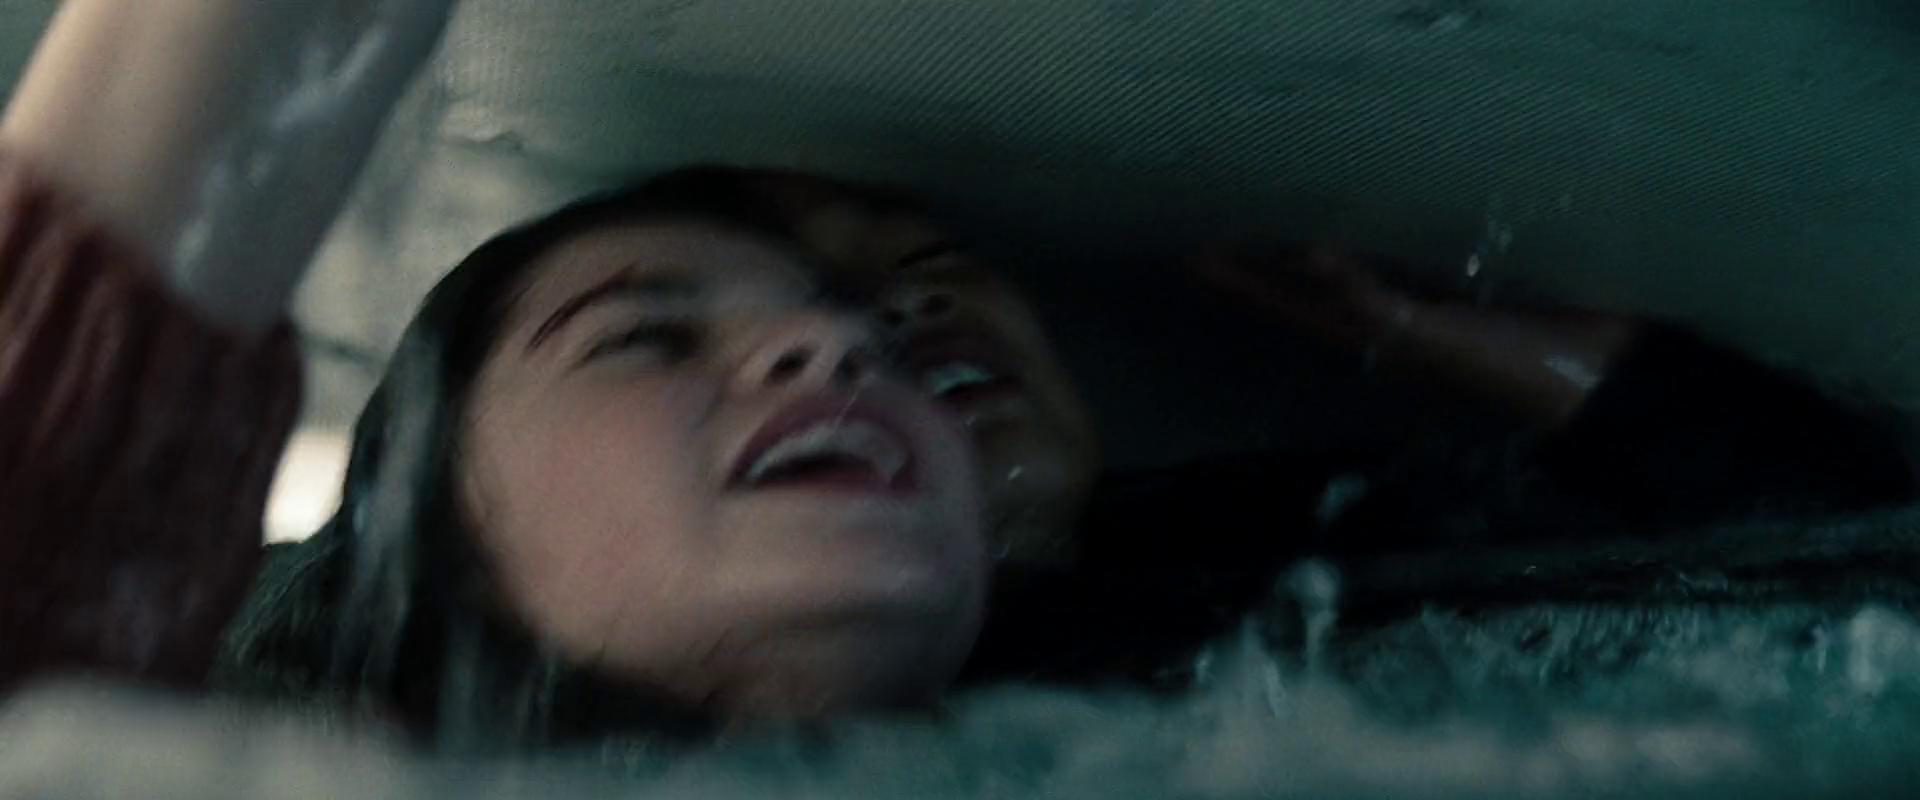 Lana Lang (DC Extended Universe)